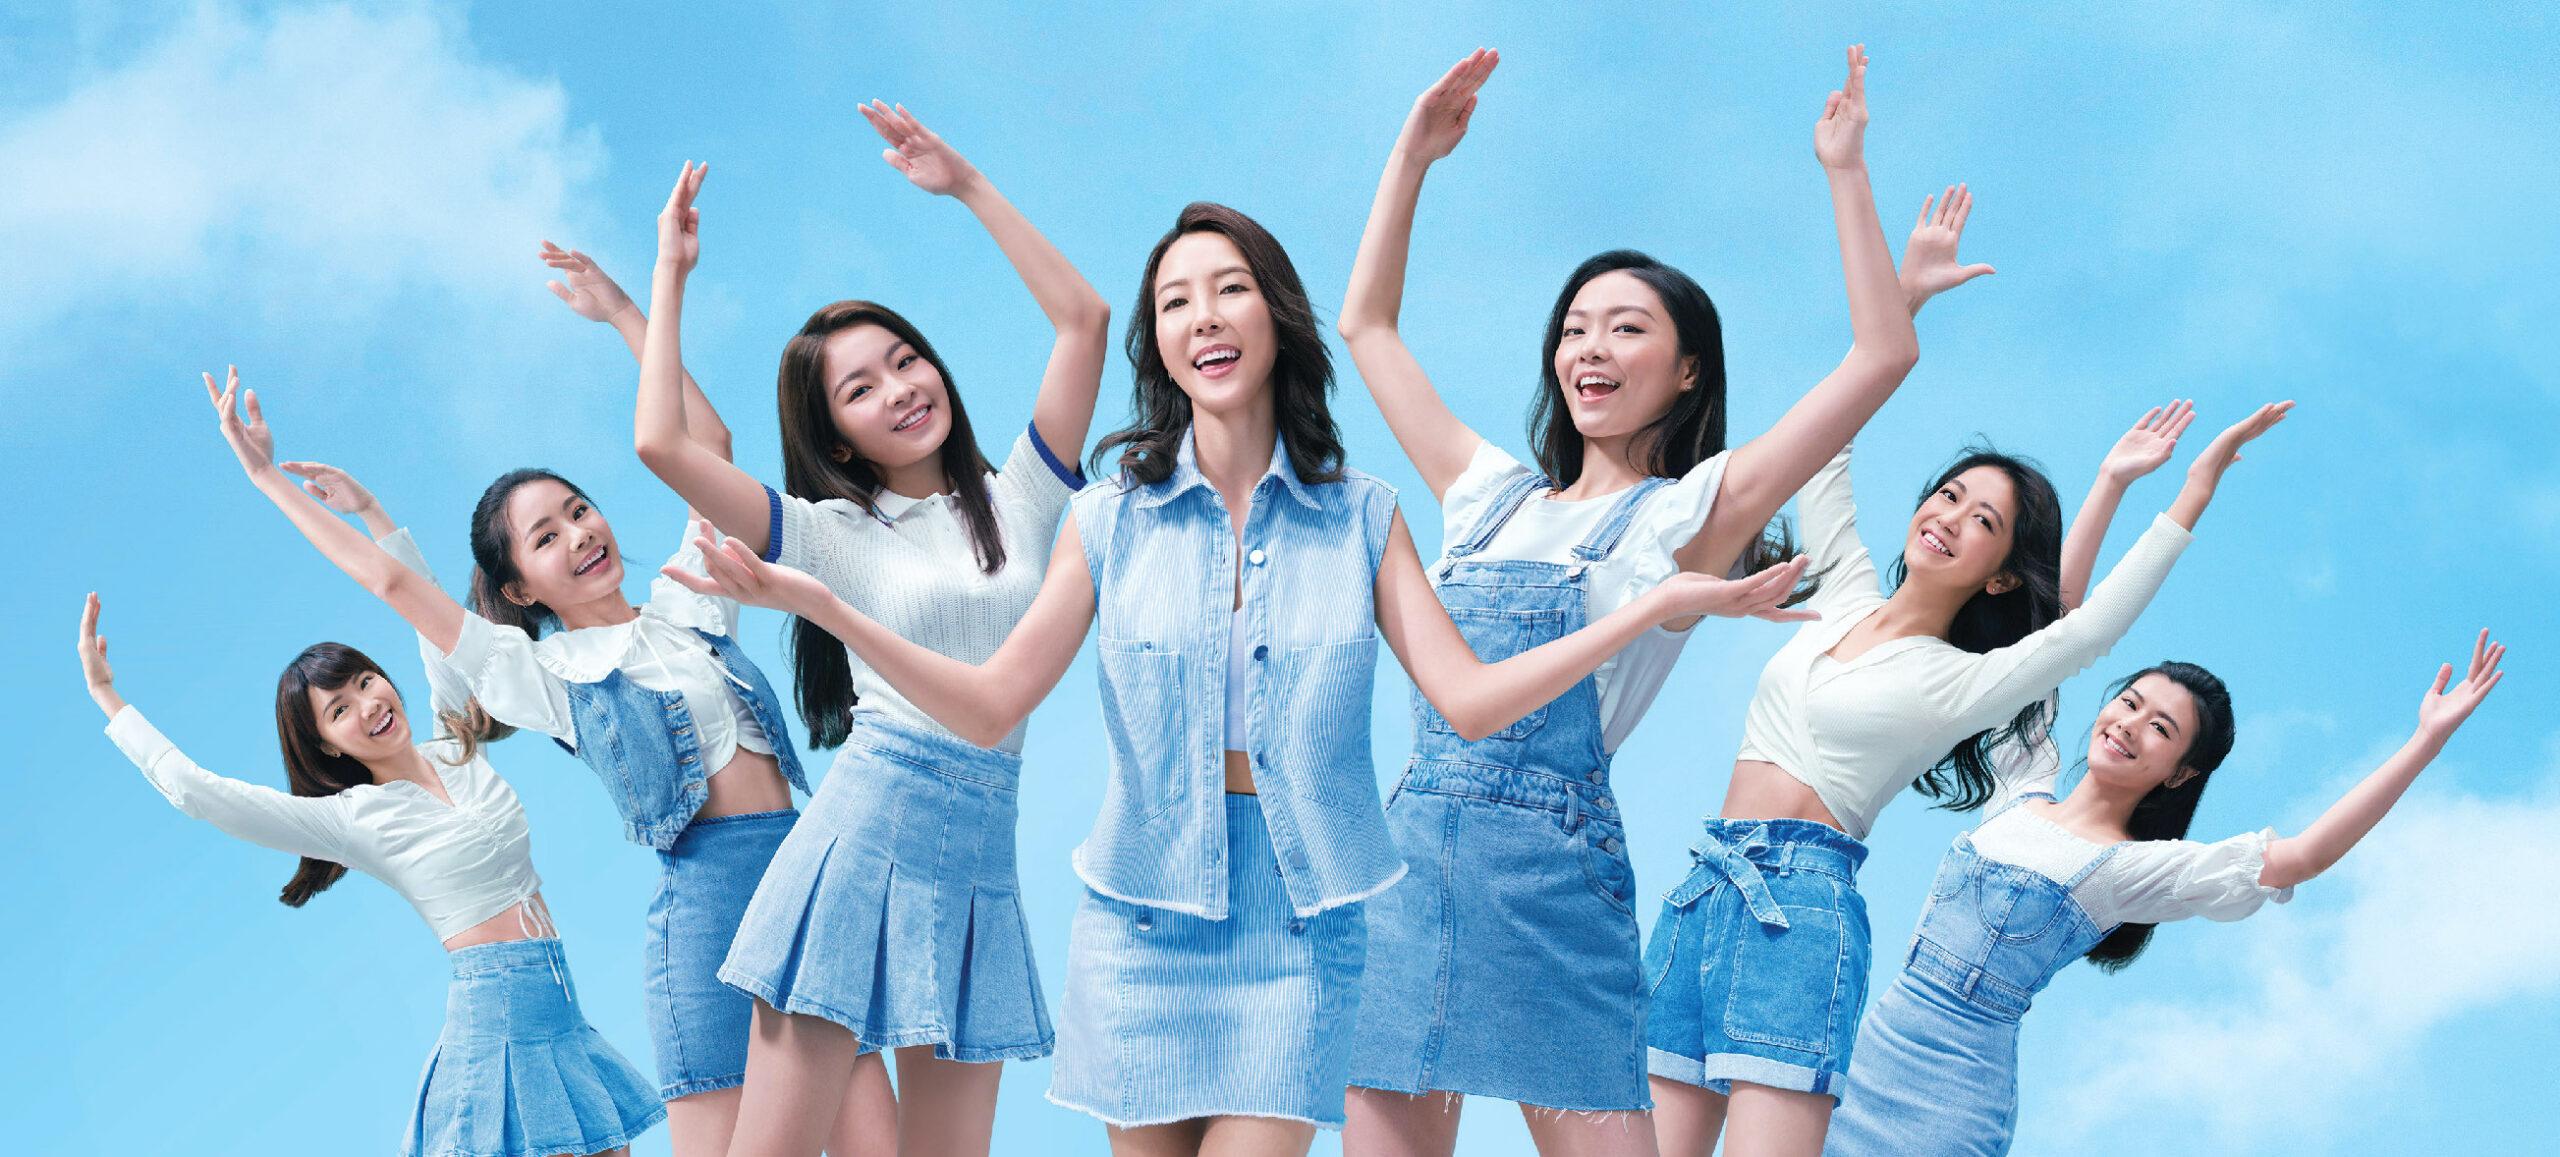 MIRROR成員爆紅帶挈女友發圍  Dee姐同天團嫂變「譚仔MIX GIRLS」拍廣告